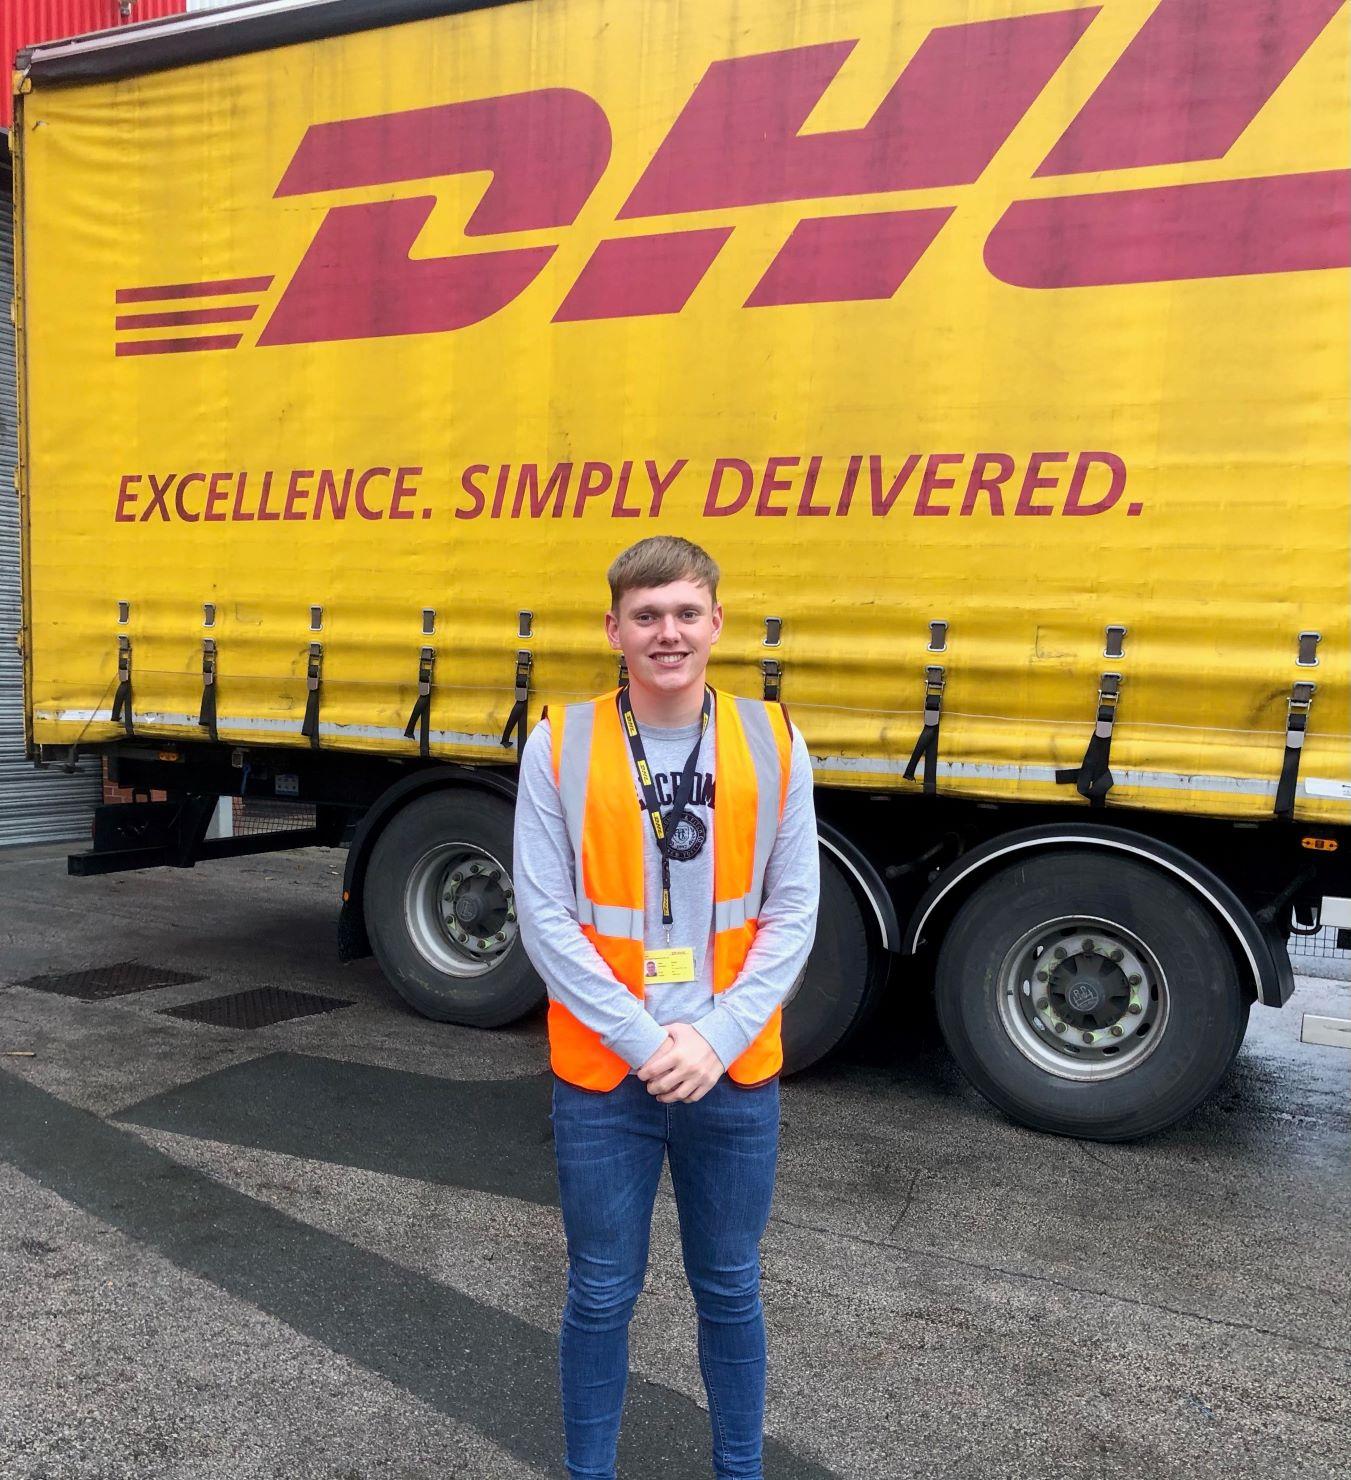 Career Success via Apprenticeship Route: Ben's Story